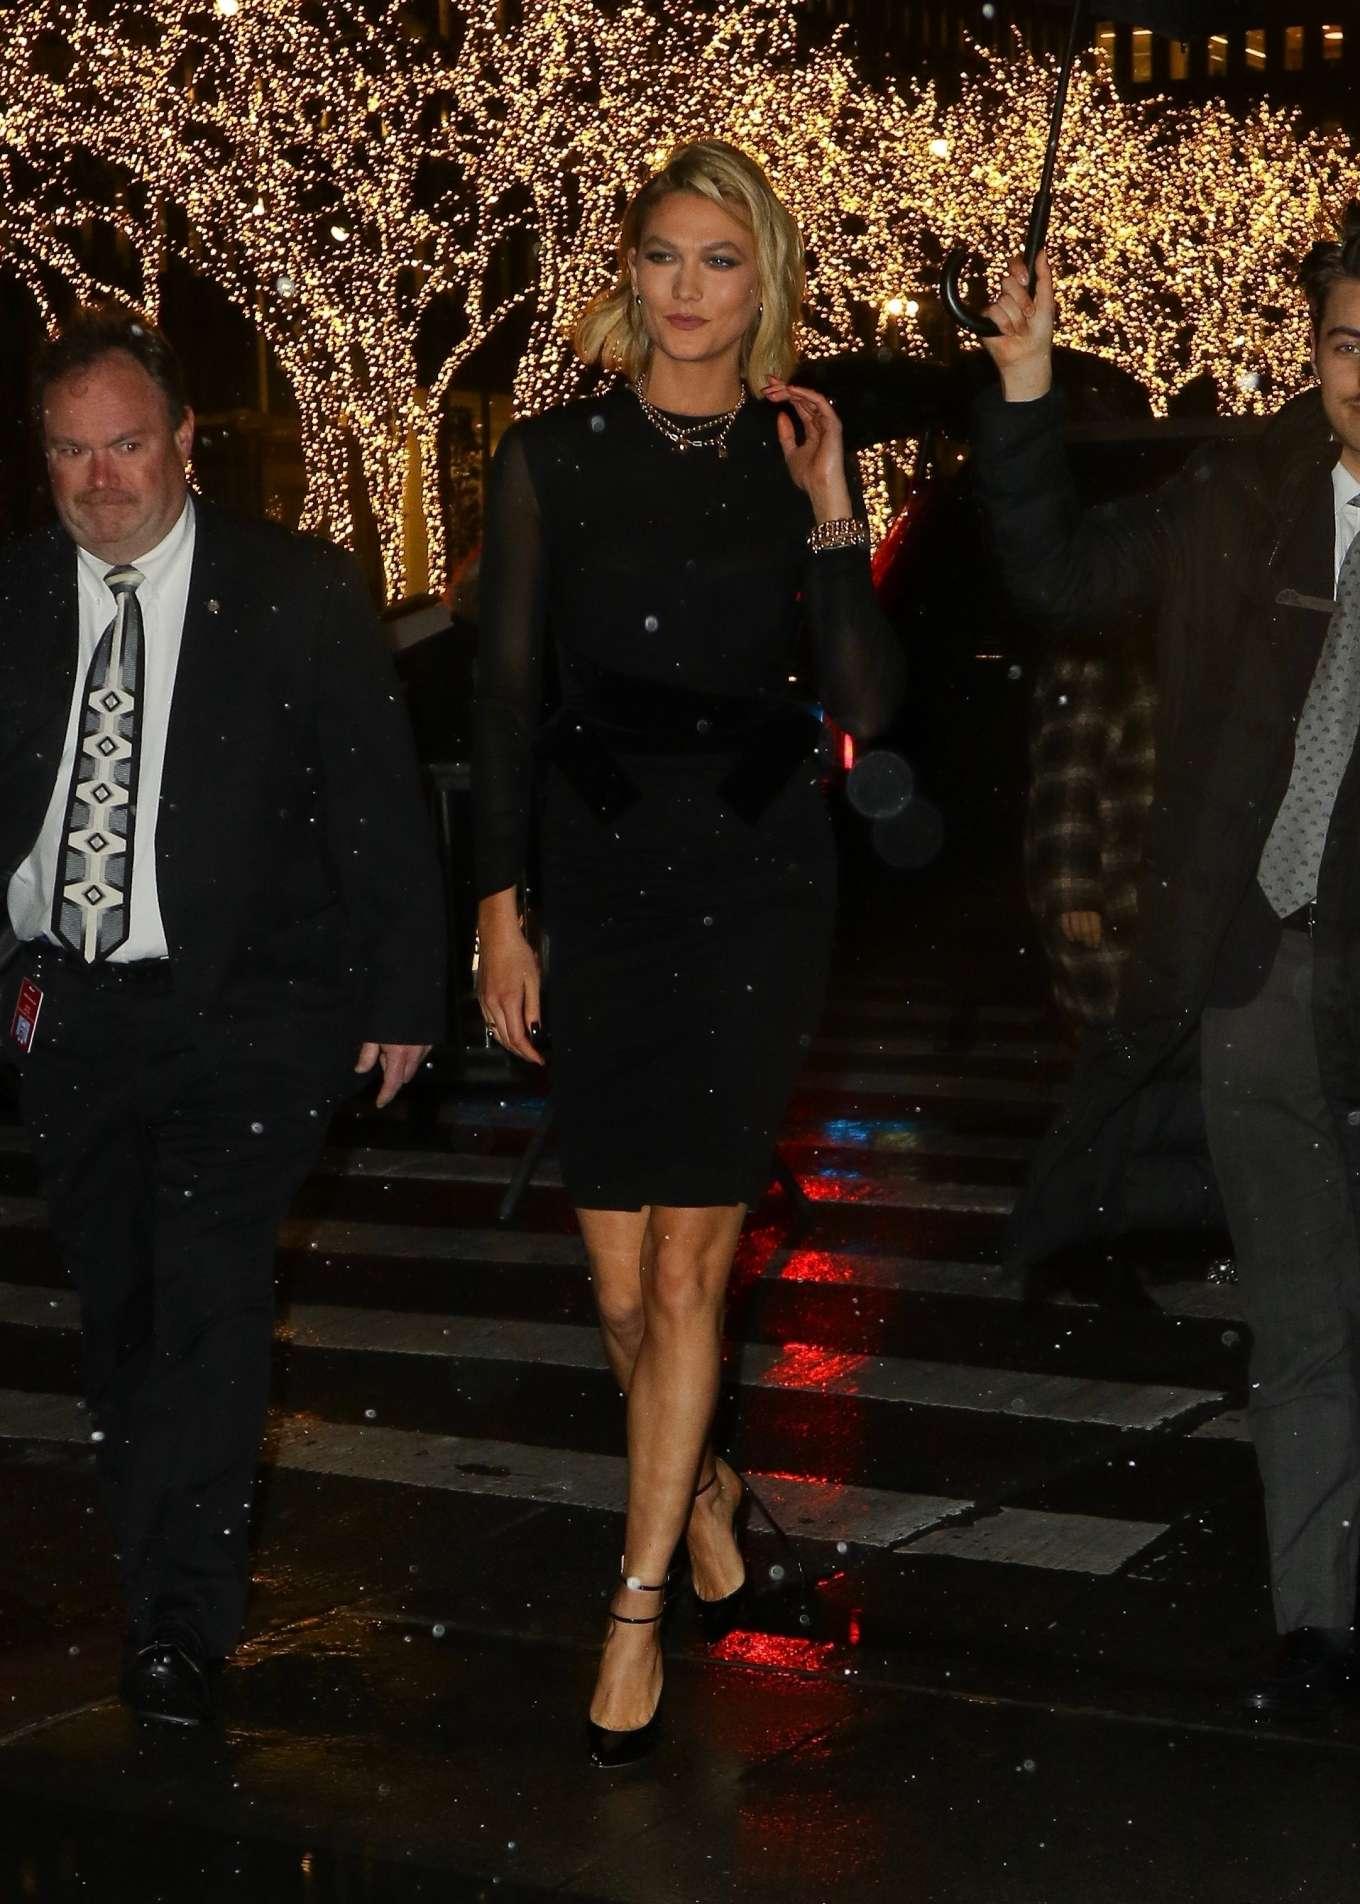 Karlie Kloss 2019 : Karlie Kloss – Arrives at The Tonight Show Starring Jimmy Fallon-02